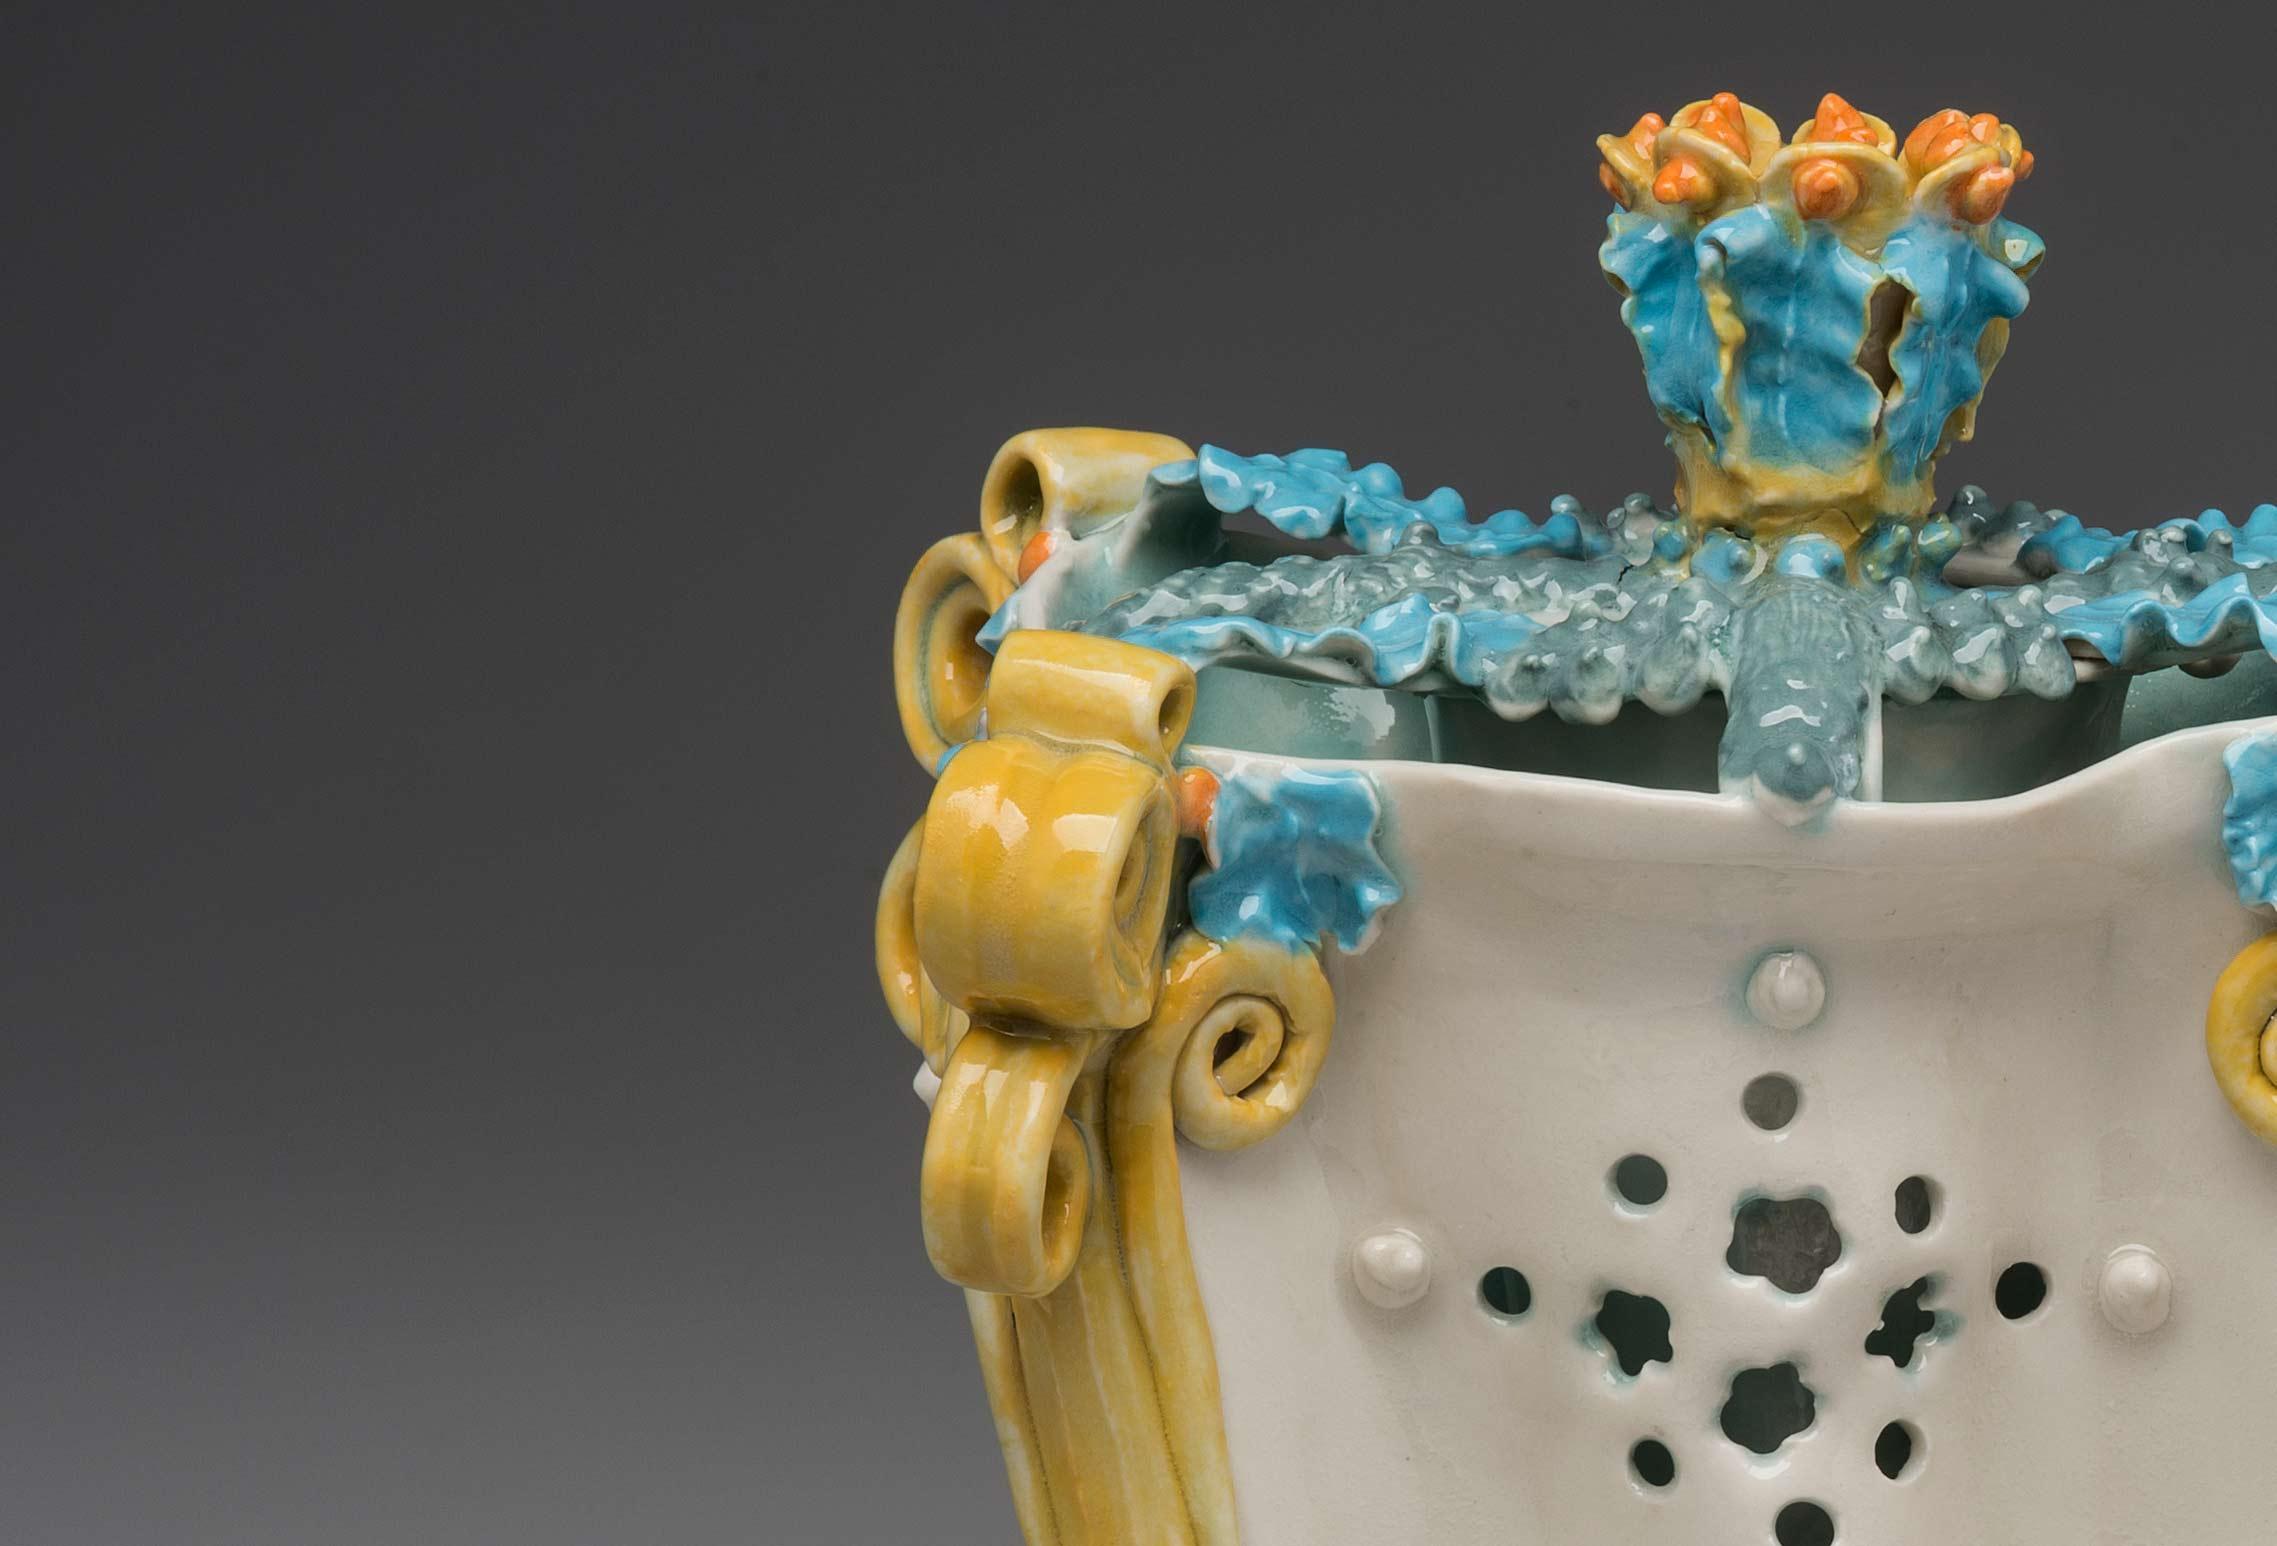 Charlotte Lindley Martin Ceramic Artist